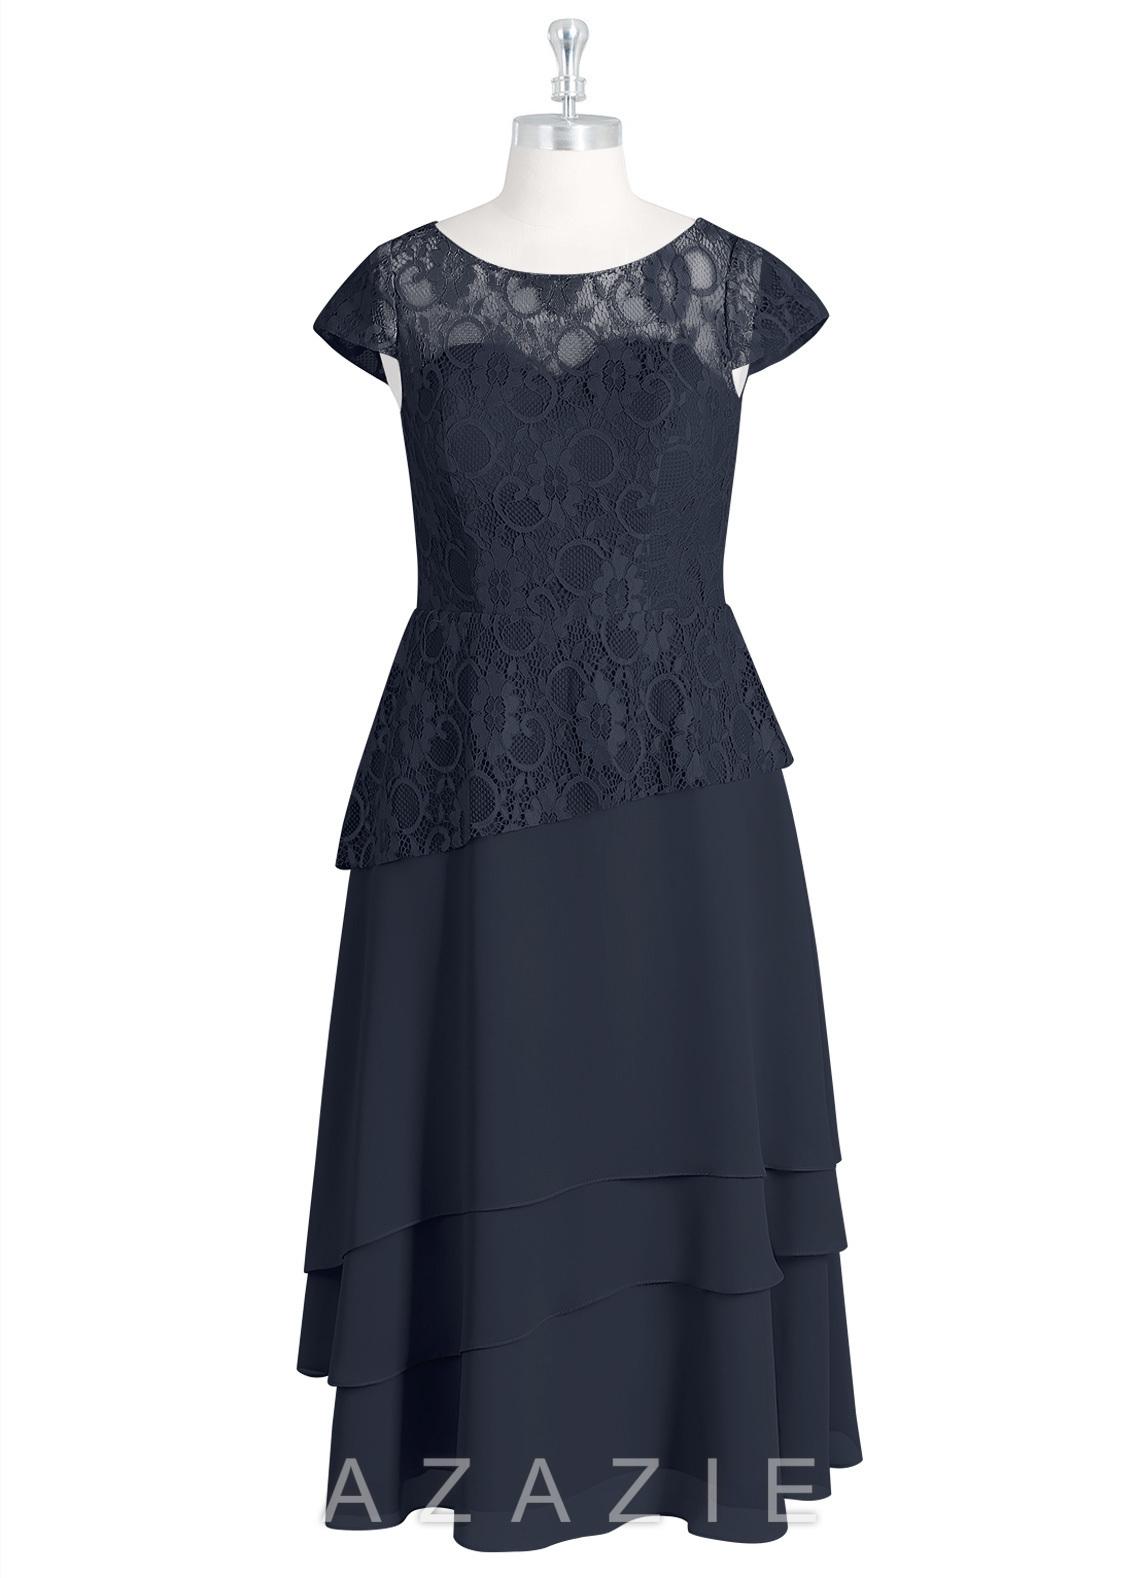 2ef252a4998f6 Azazie Madeline MBD Mother Of The Bride Dress | Azazie